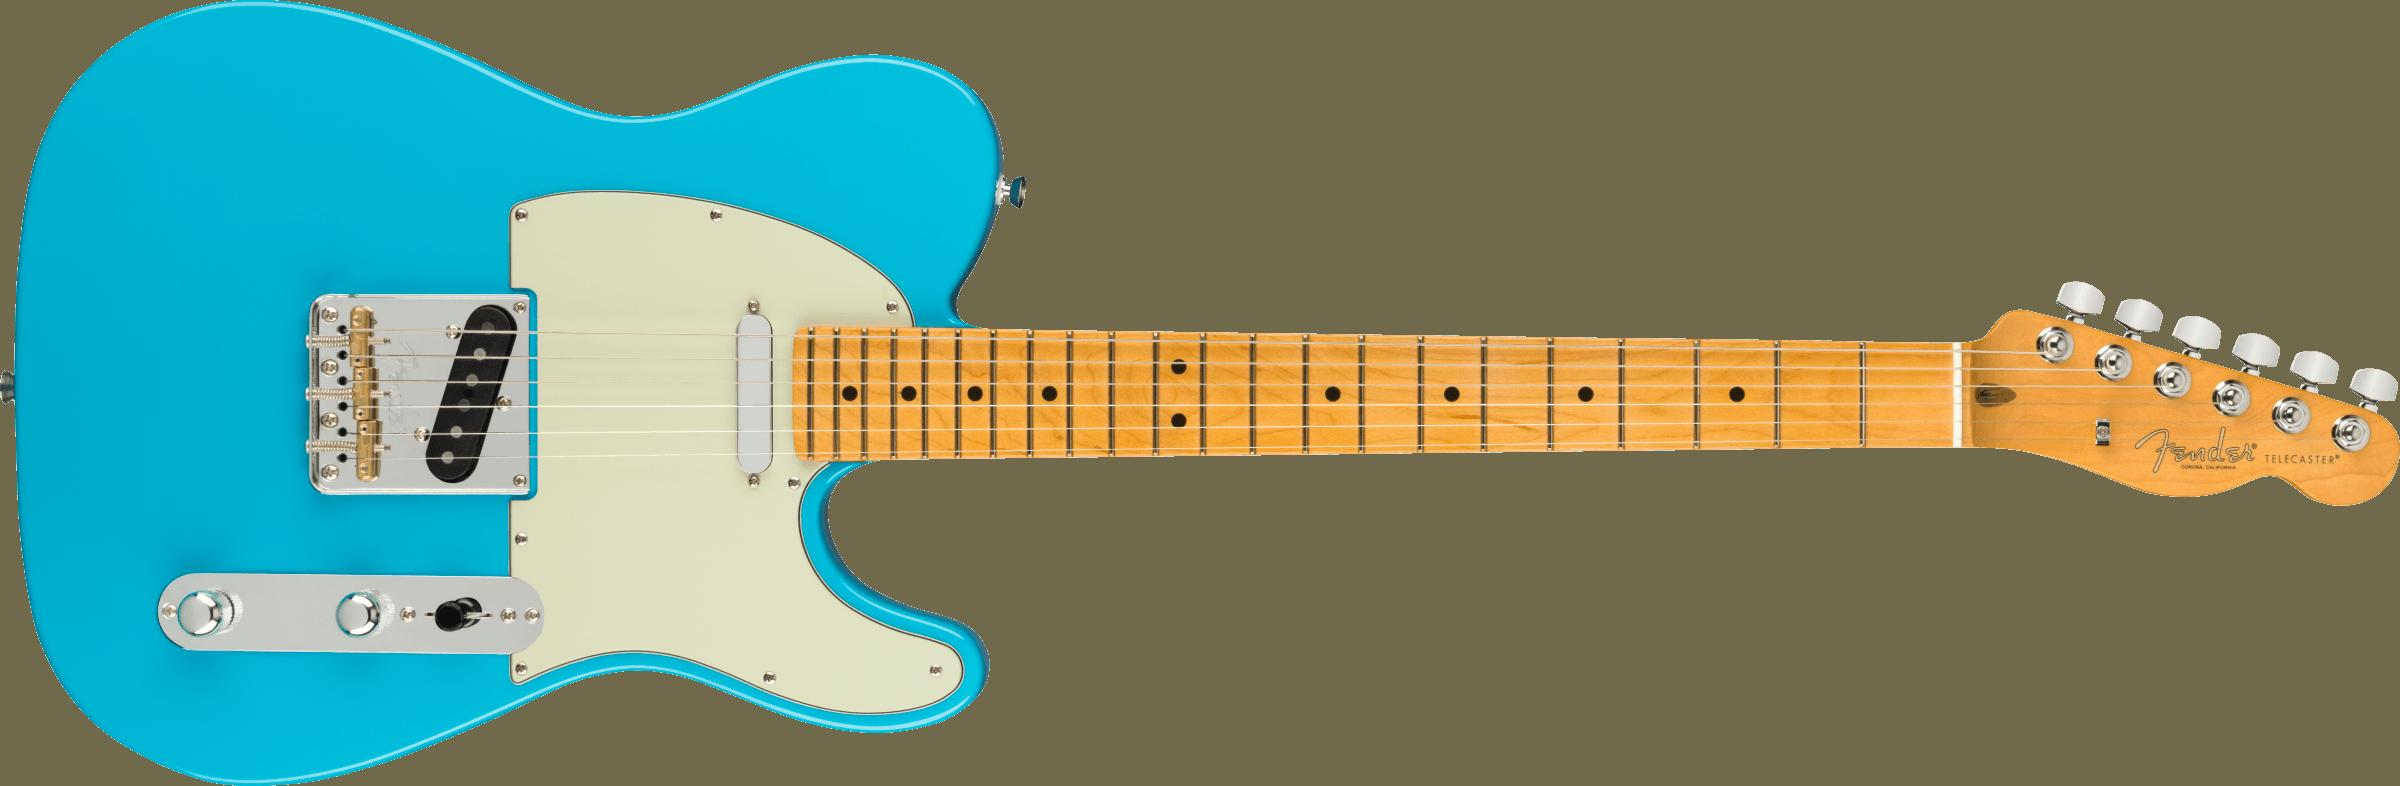 FENDER-American-Professional-II-Telecaster-Maple-Fingerboard-Miami-Blue-sku-571005548